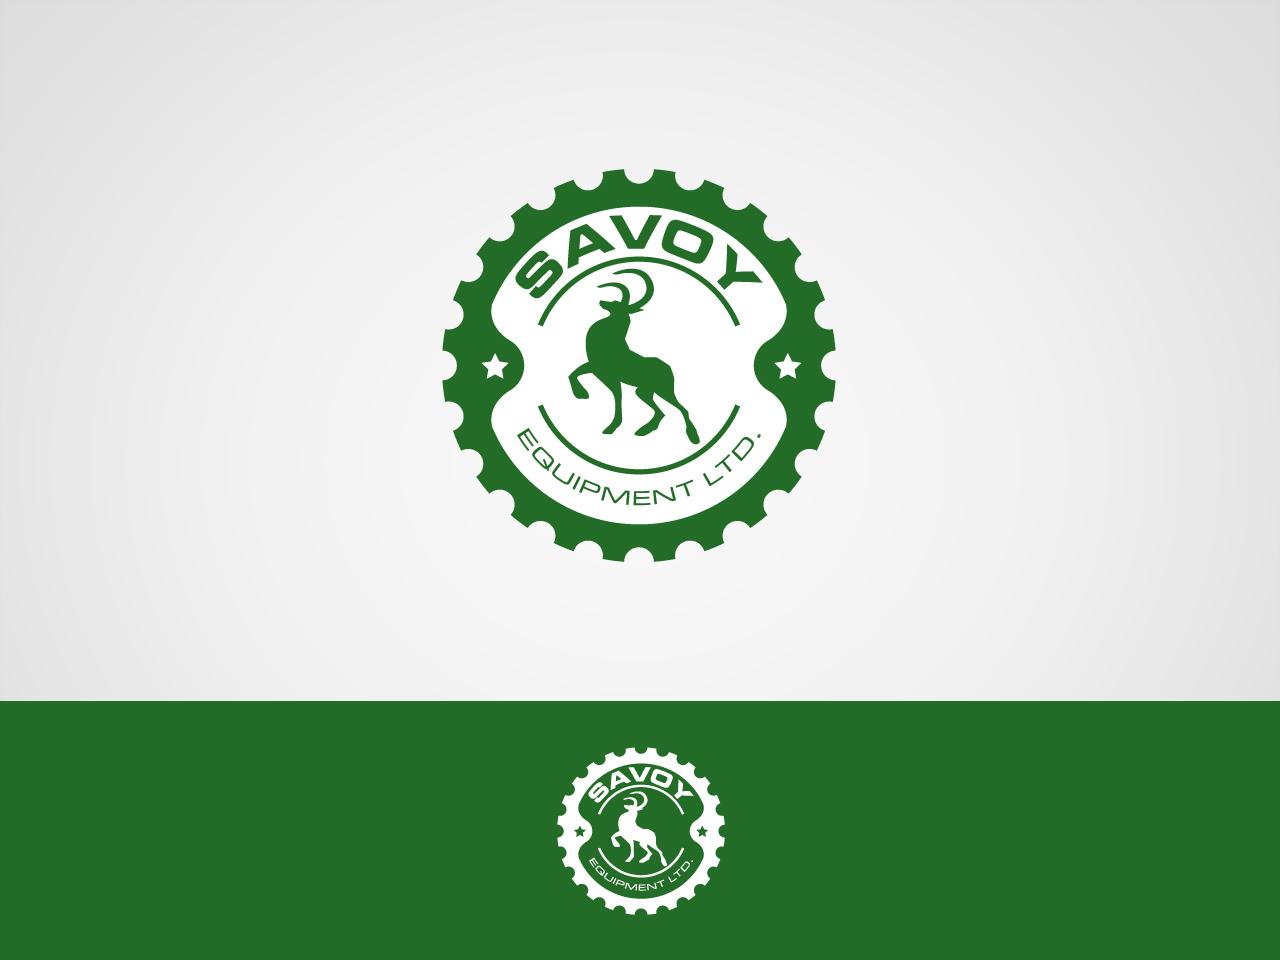 Logo Design by jpbituin - Entry No. 81 in the Logo Design Contest Inspiring Logo Design for Savoy Equipment Ltd..